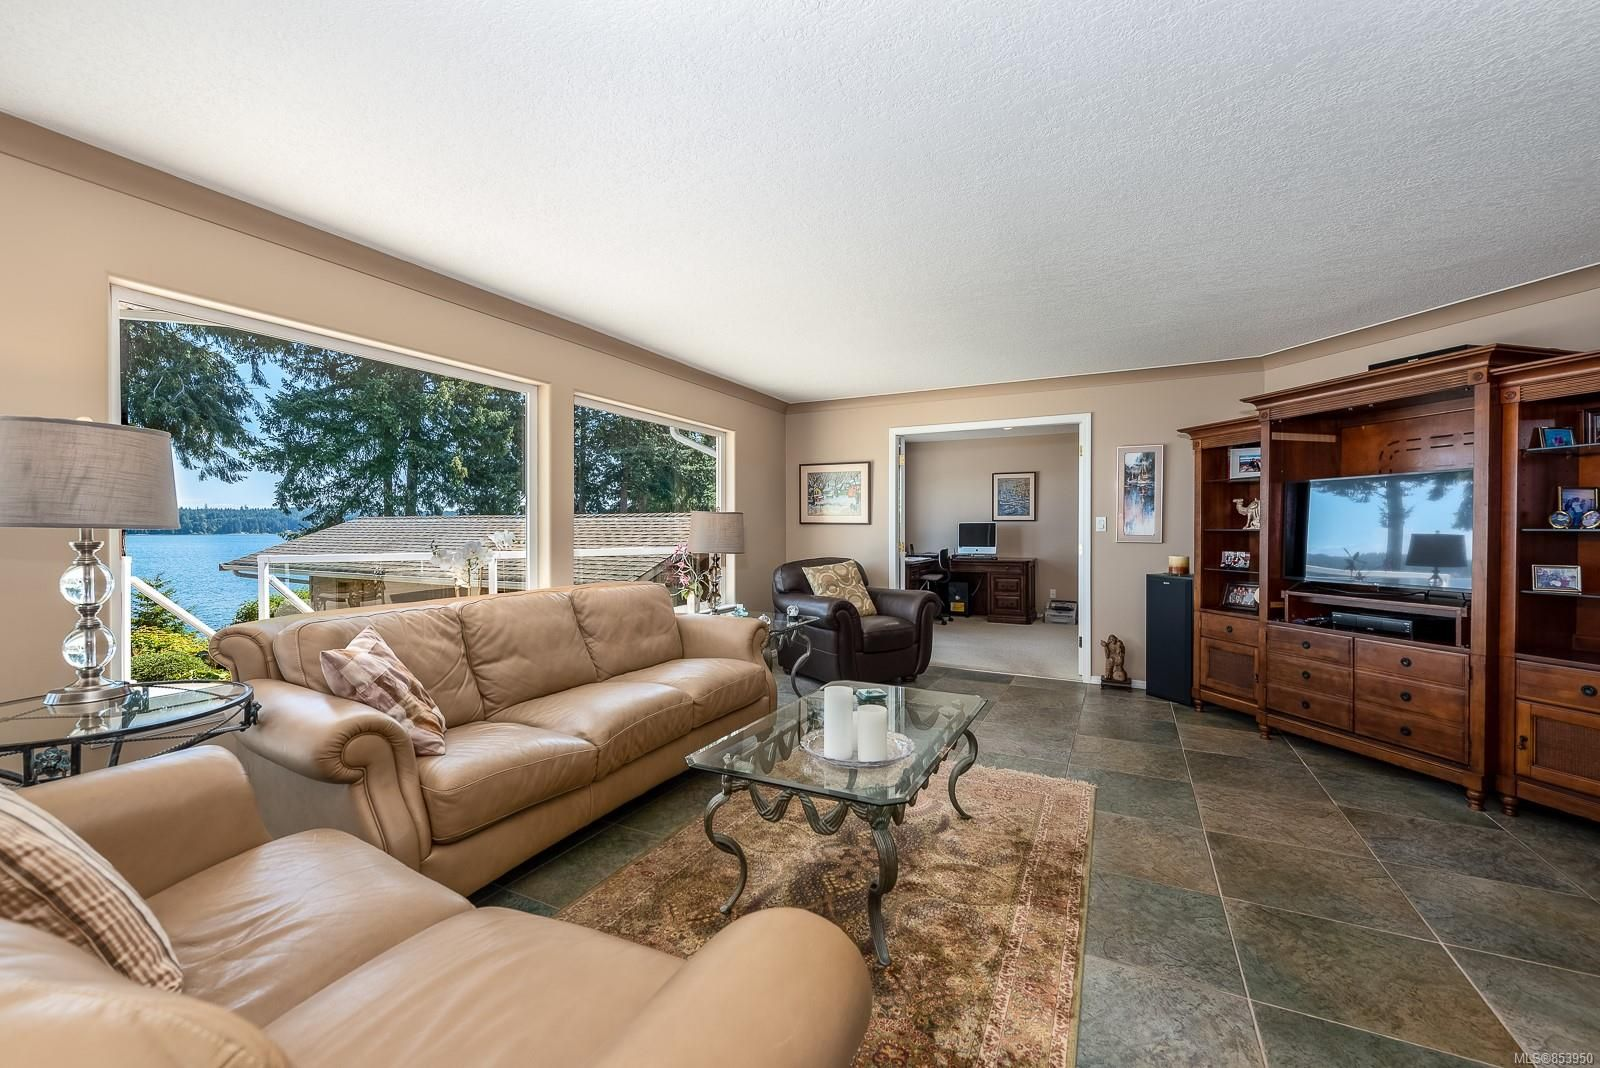 Photo 17: Photos: 5880 GARVIN Rd in : CV Union Bay/Fanny Bay House for sale (Comox Valley)  : MLS®# 853950